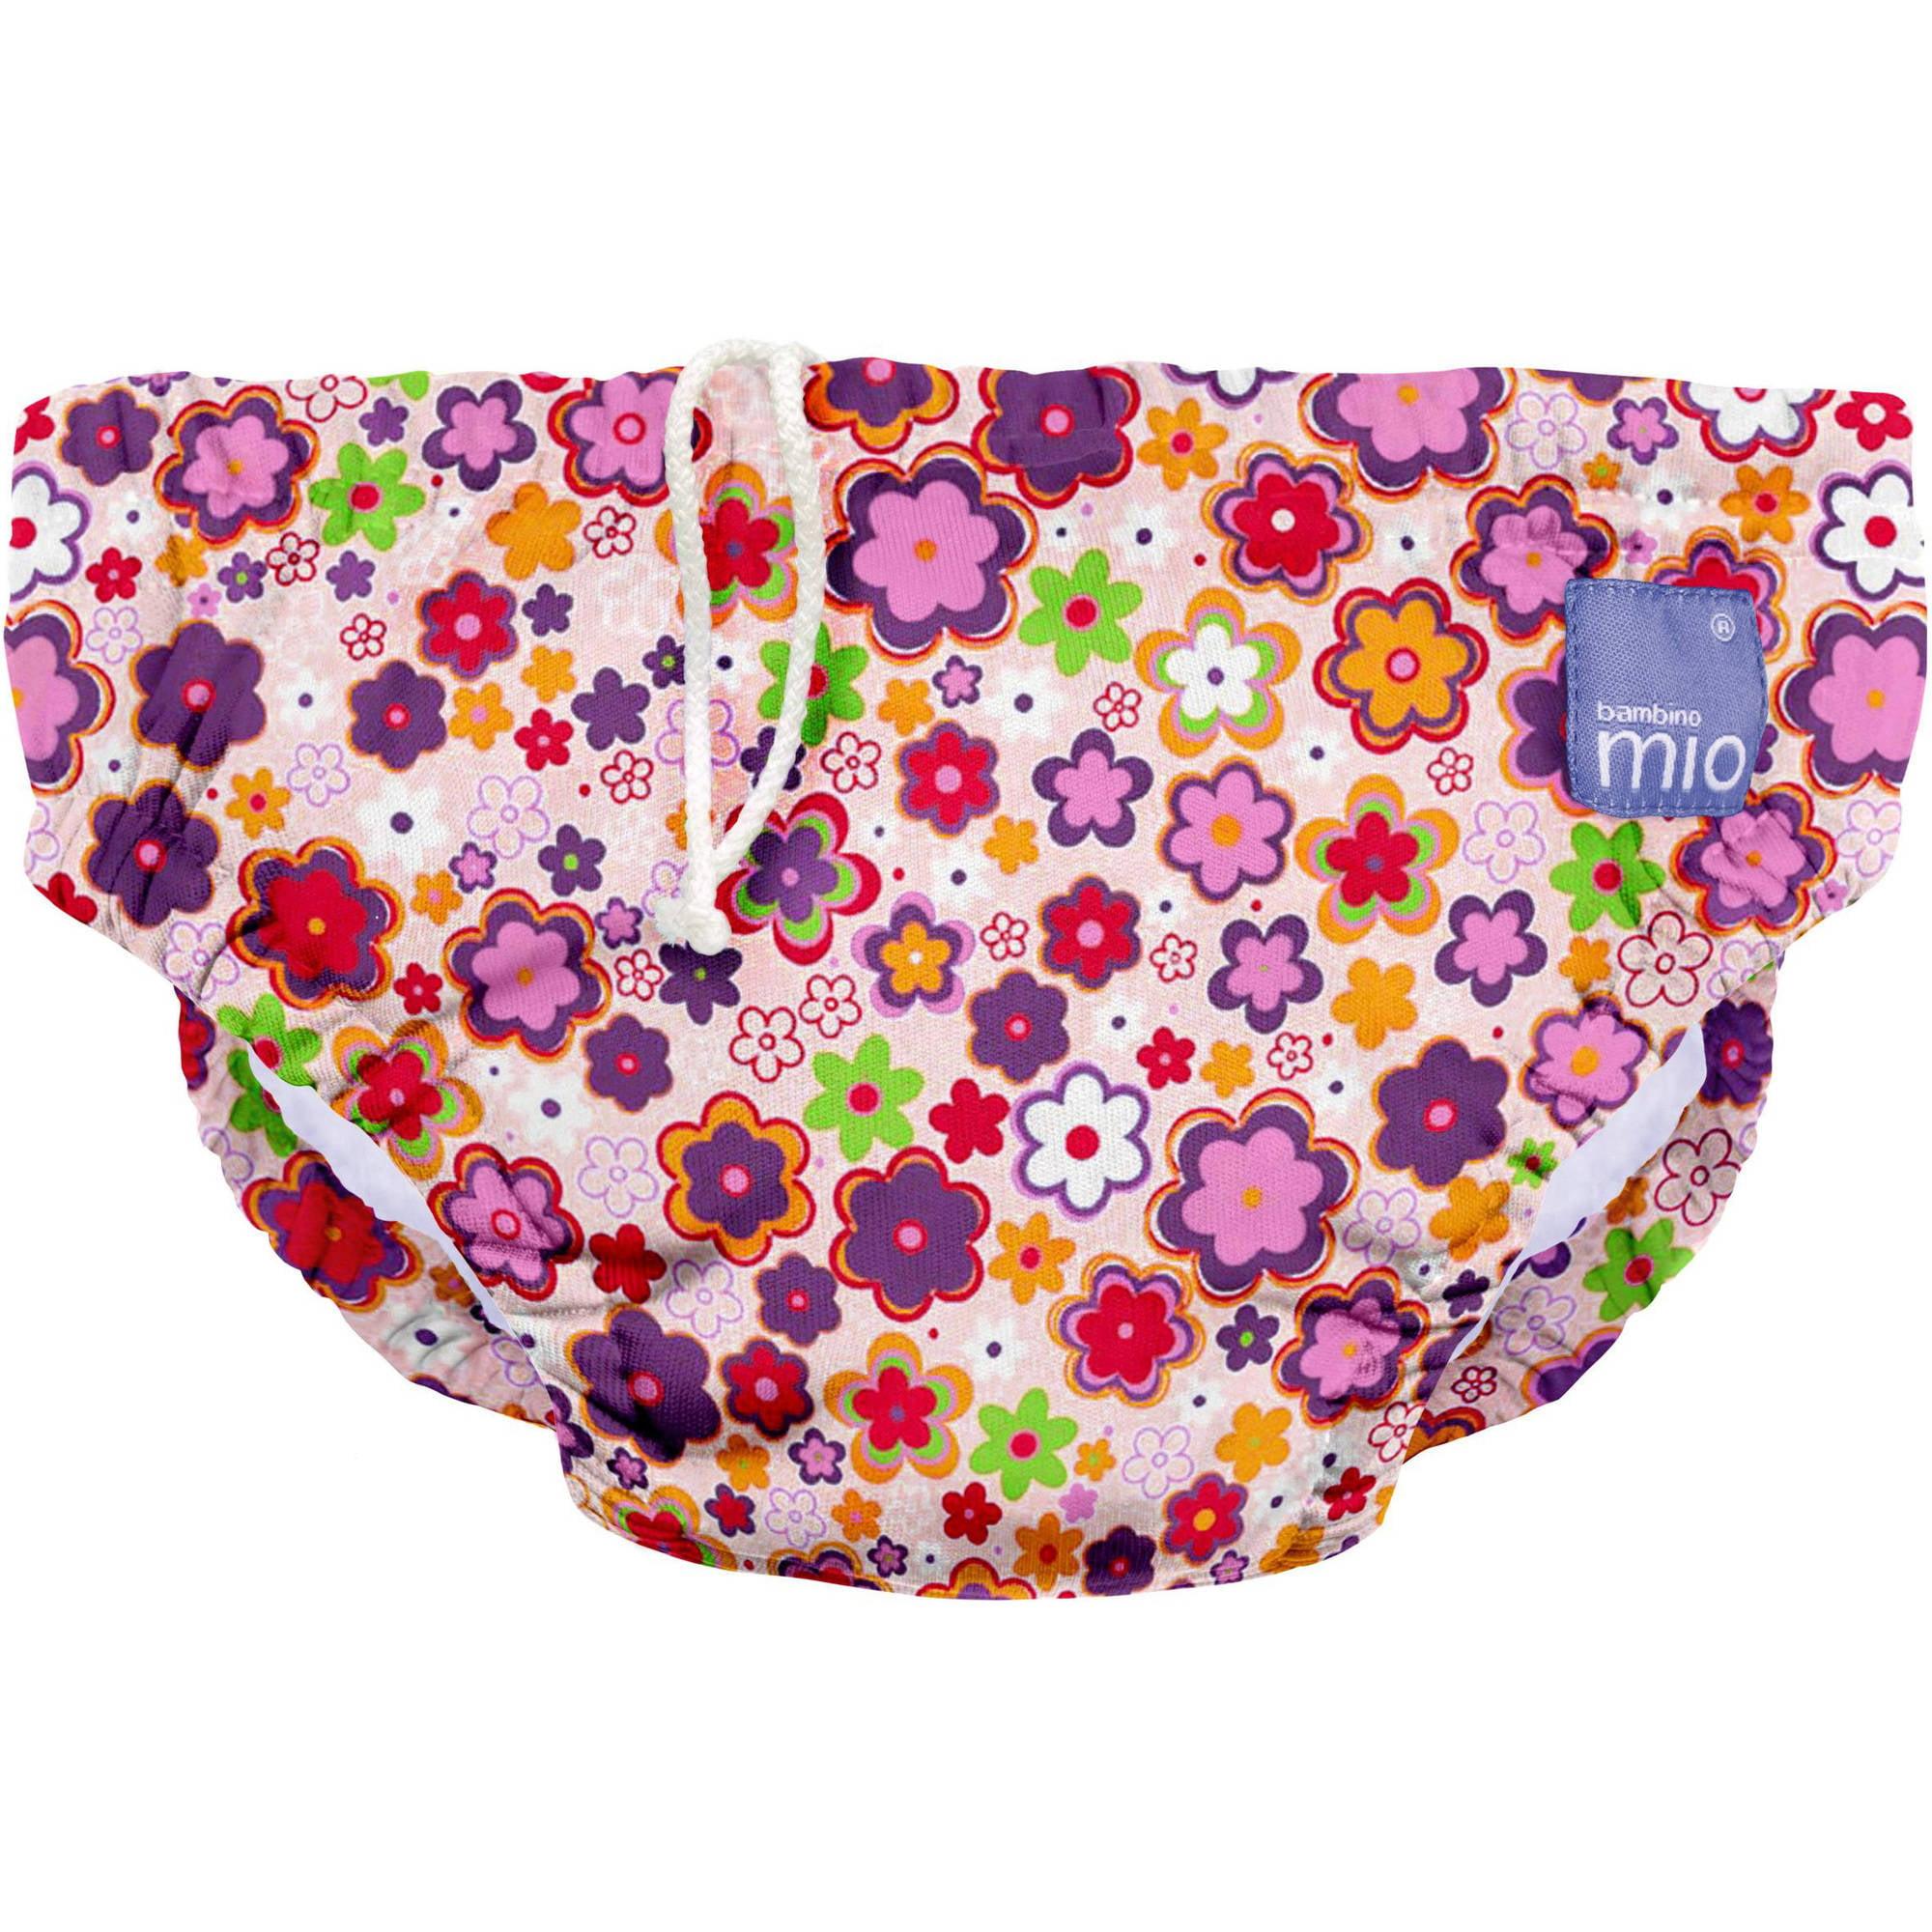 Bambino Mio Reusable Swim Diaper, Ditzy Floral, (Choose Your Size)